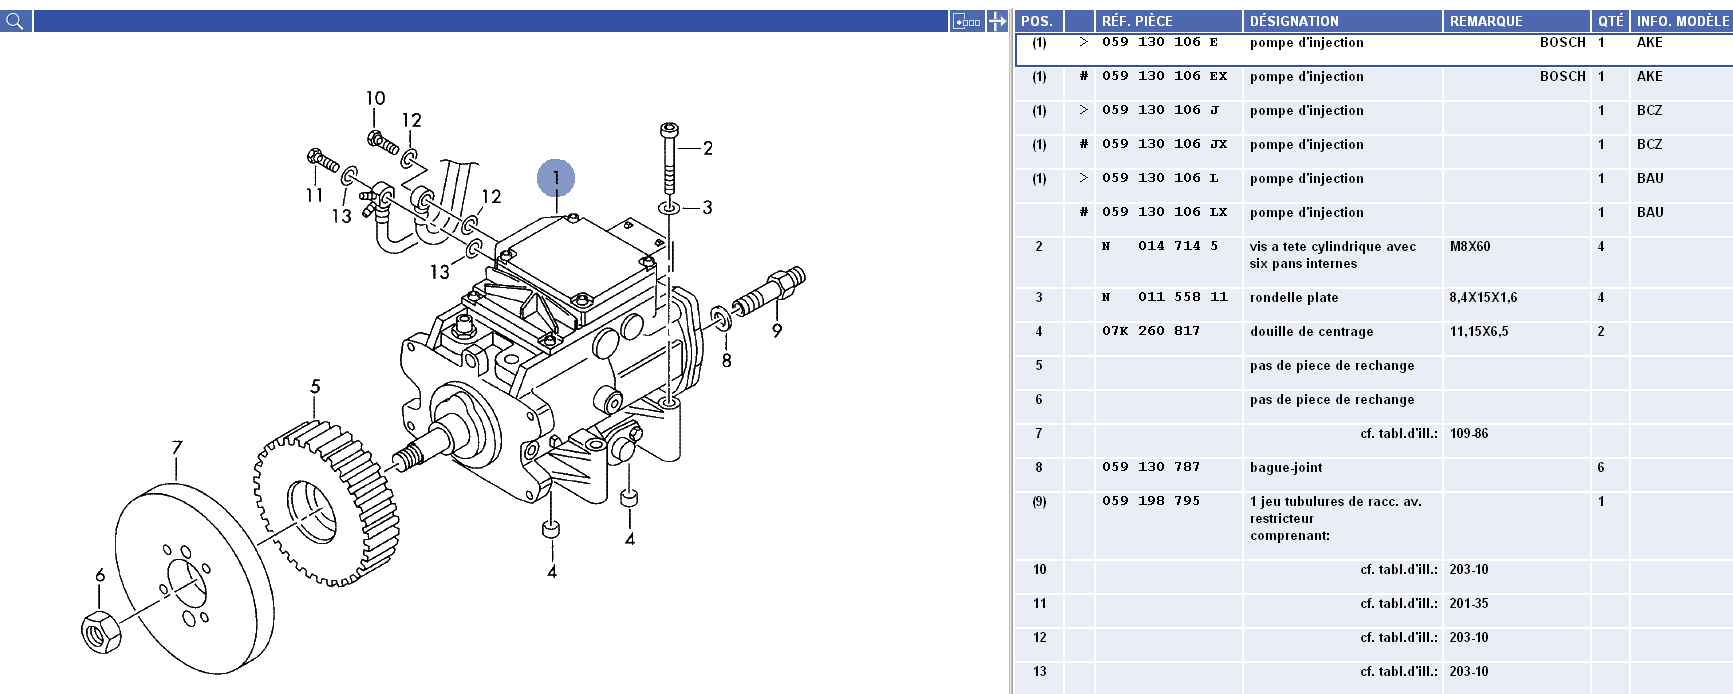 etka-pompe-injection-audi-a6-allroad-moteur-ake.png